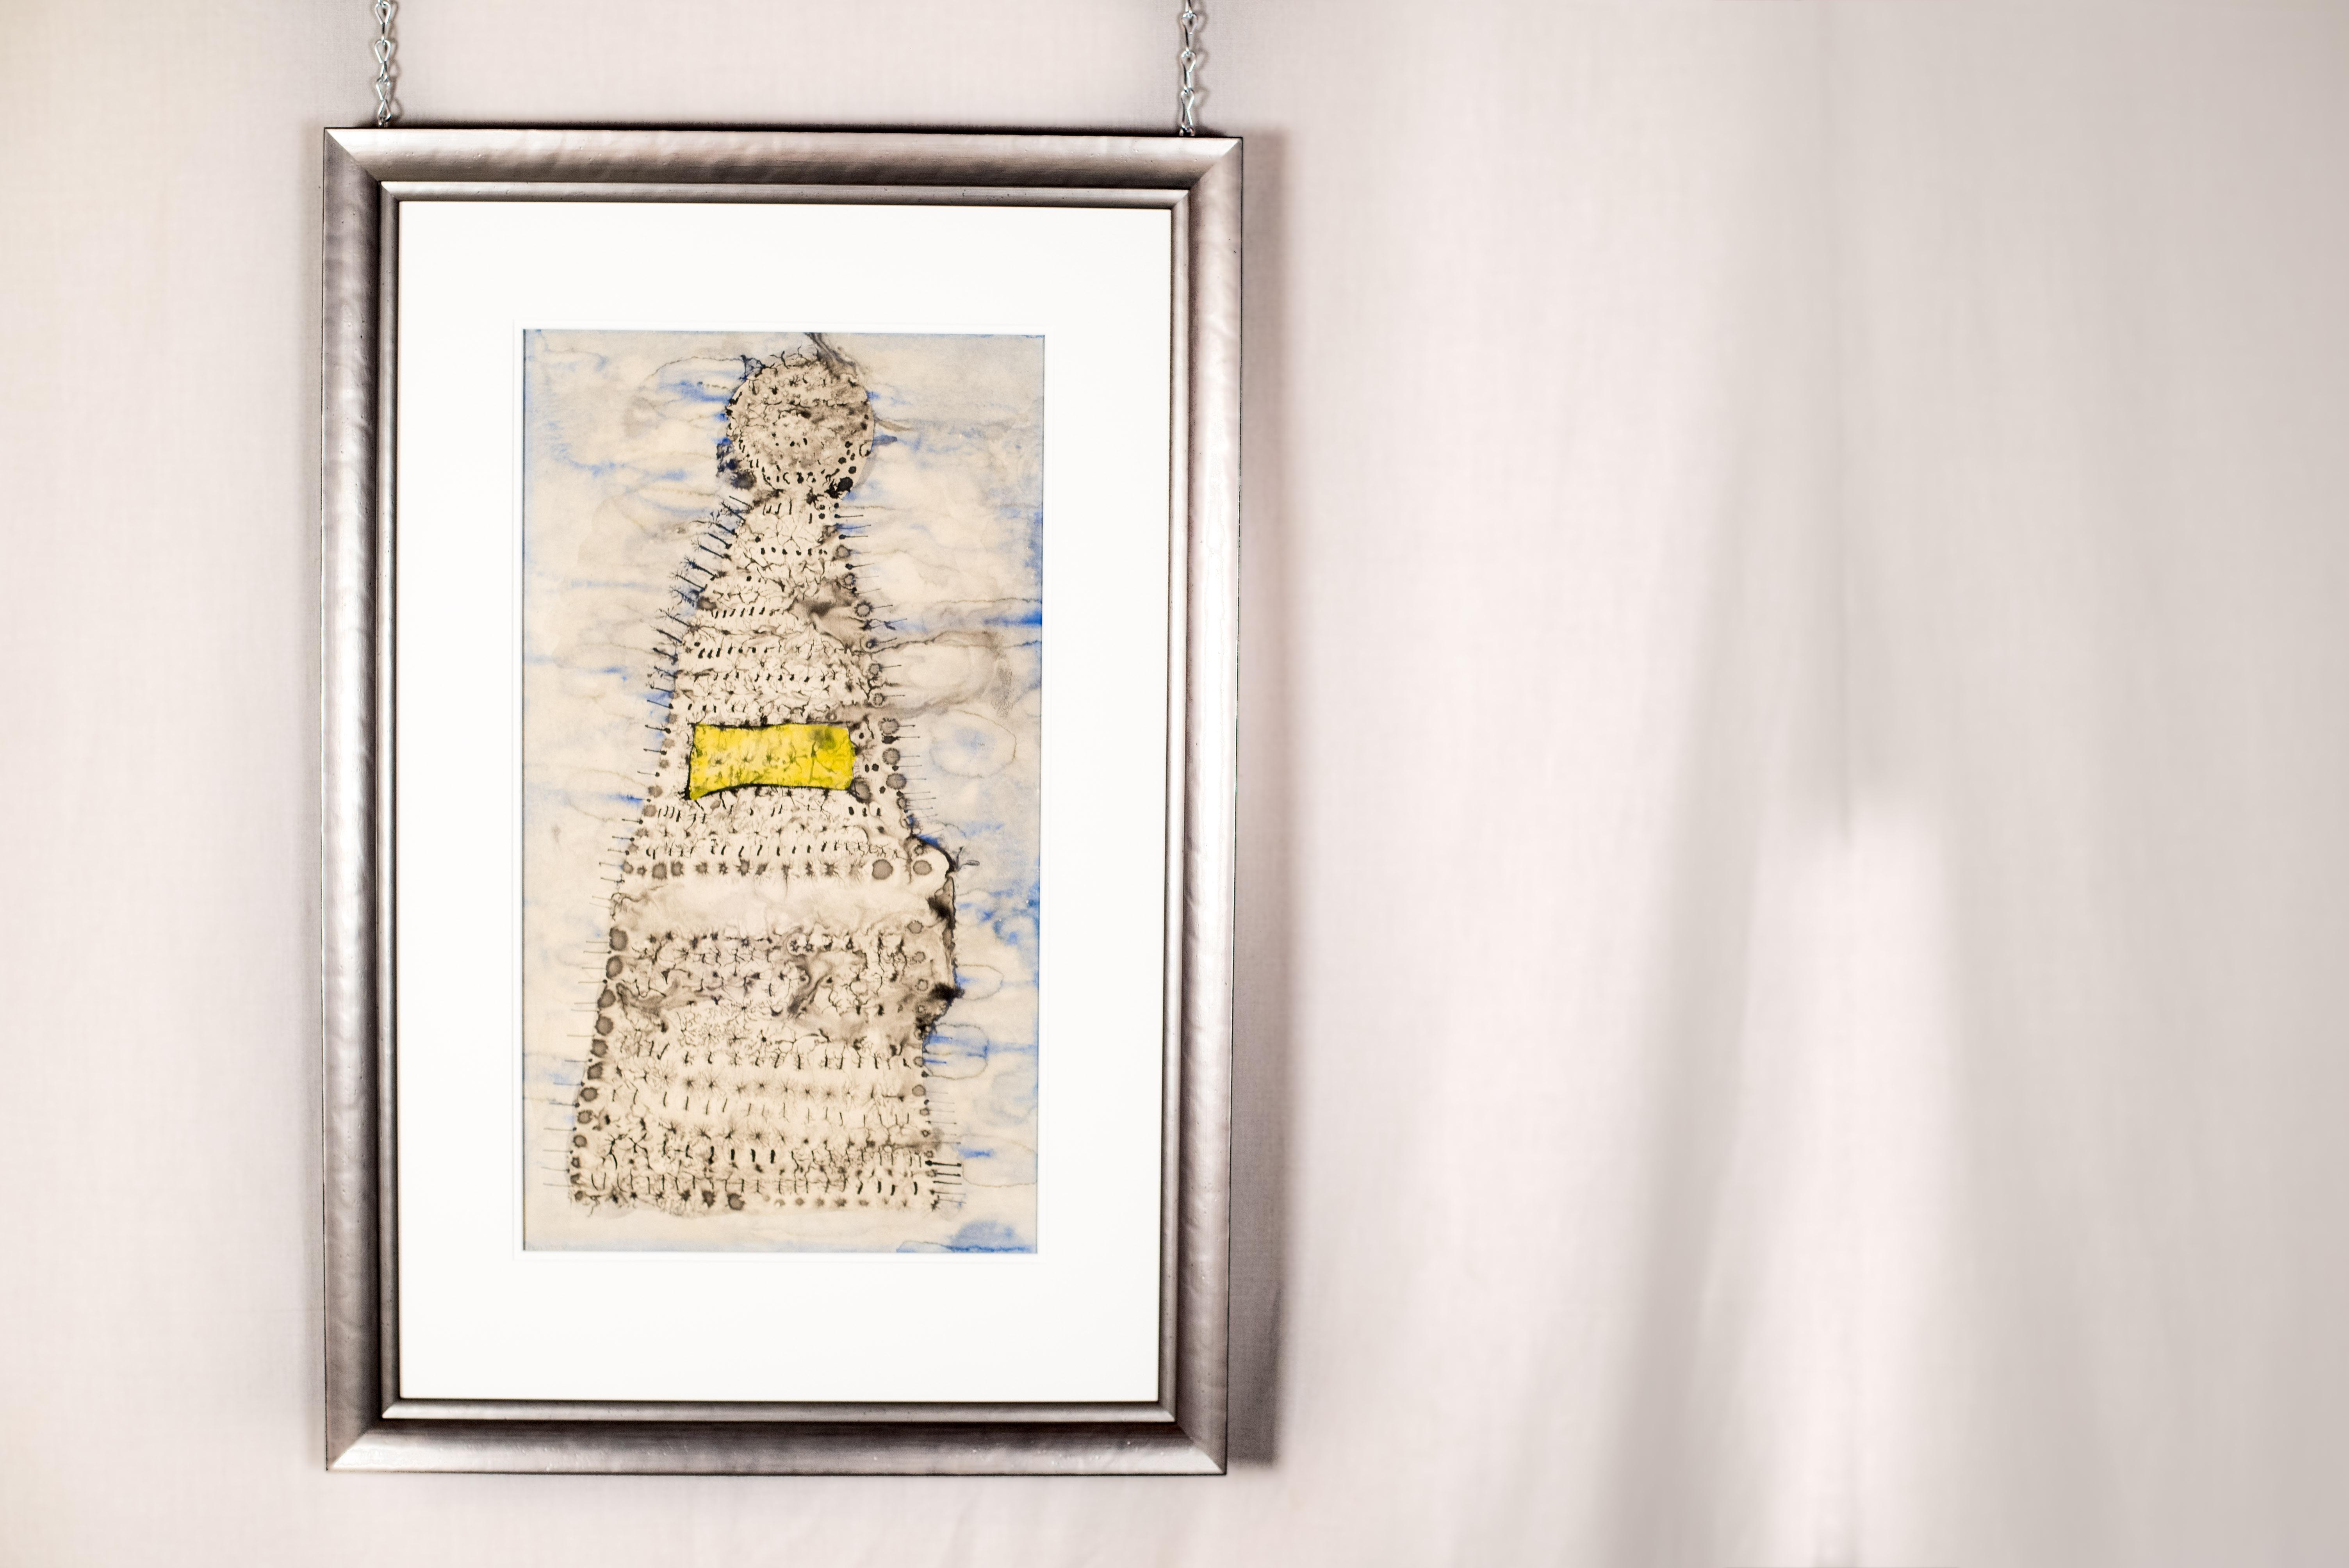 Find art galleries Esses